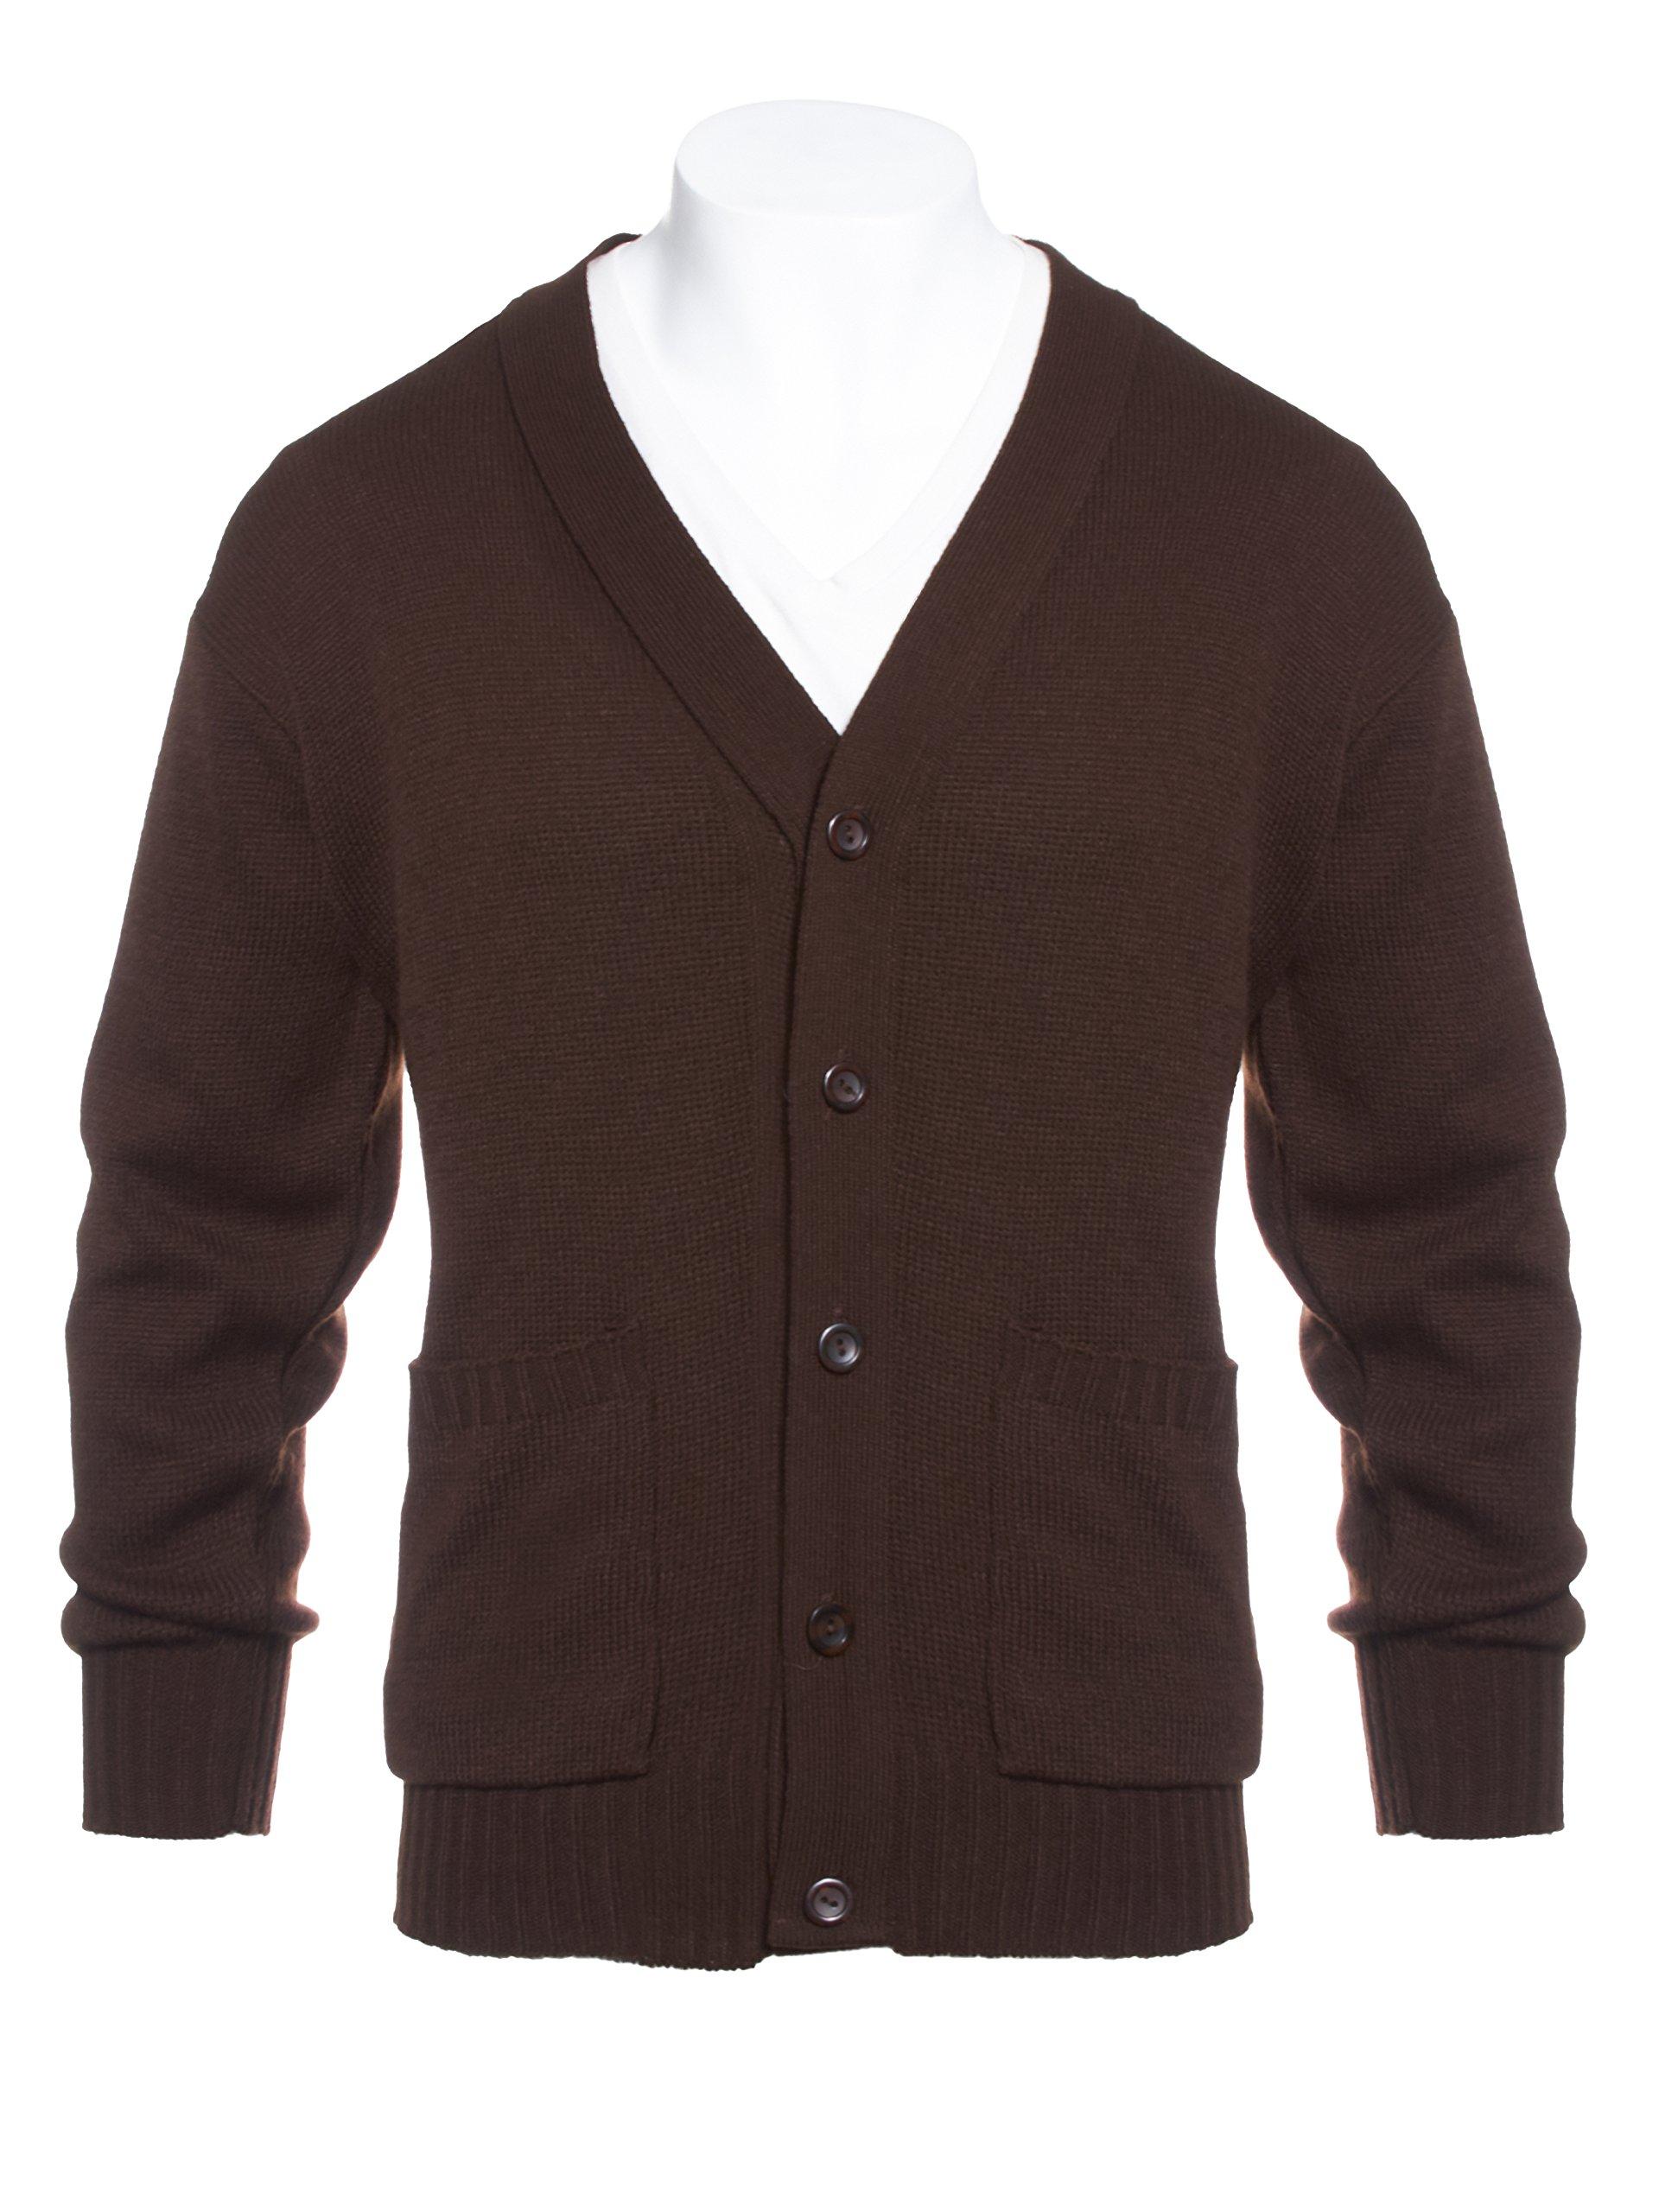 Knit Minded Mens Flat Knit Two Pocket Cardigan Brown XL